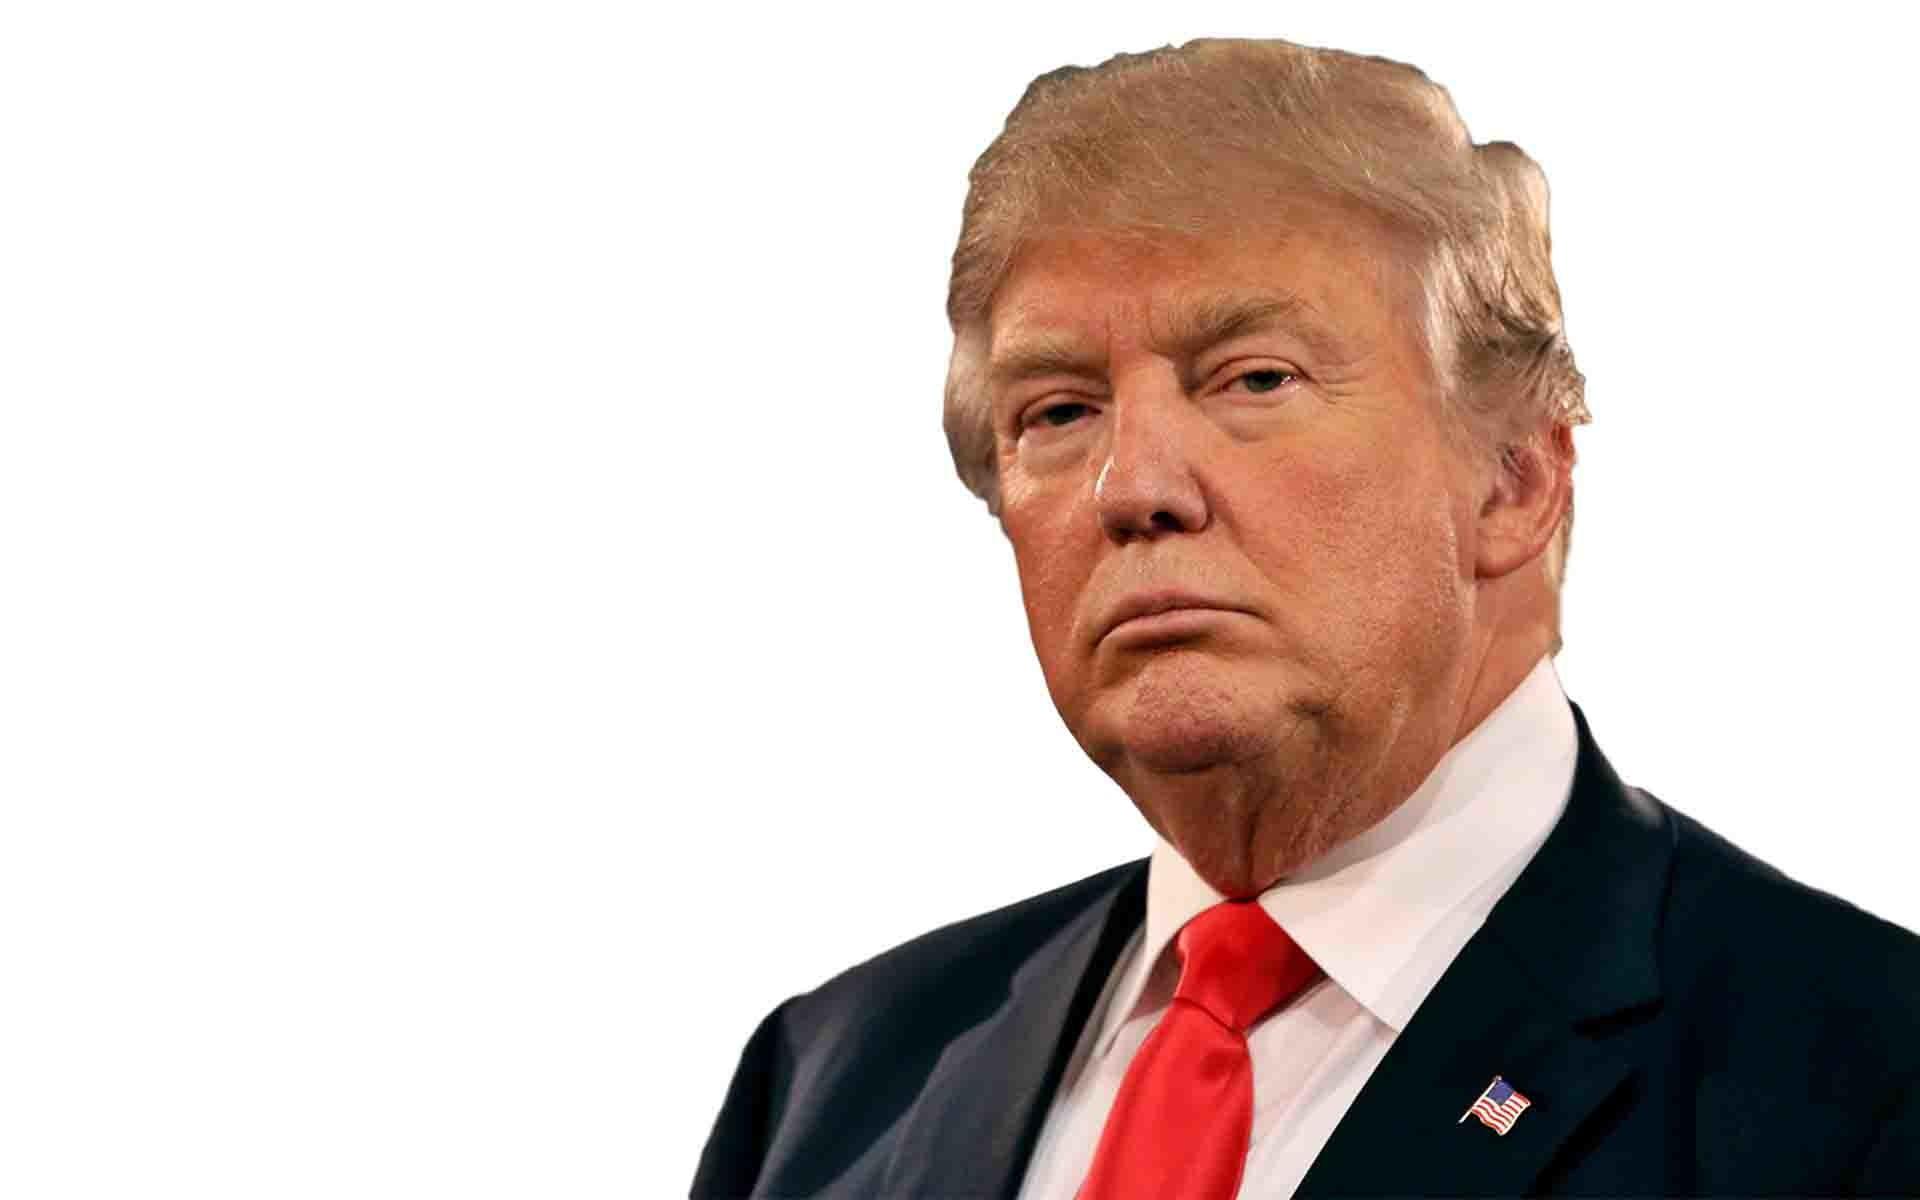 Donald-Trump-HD-Wallpapers-Free-Download-For-Desktop- …